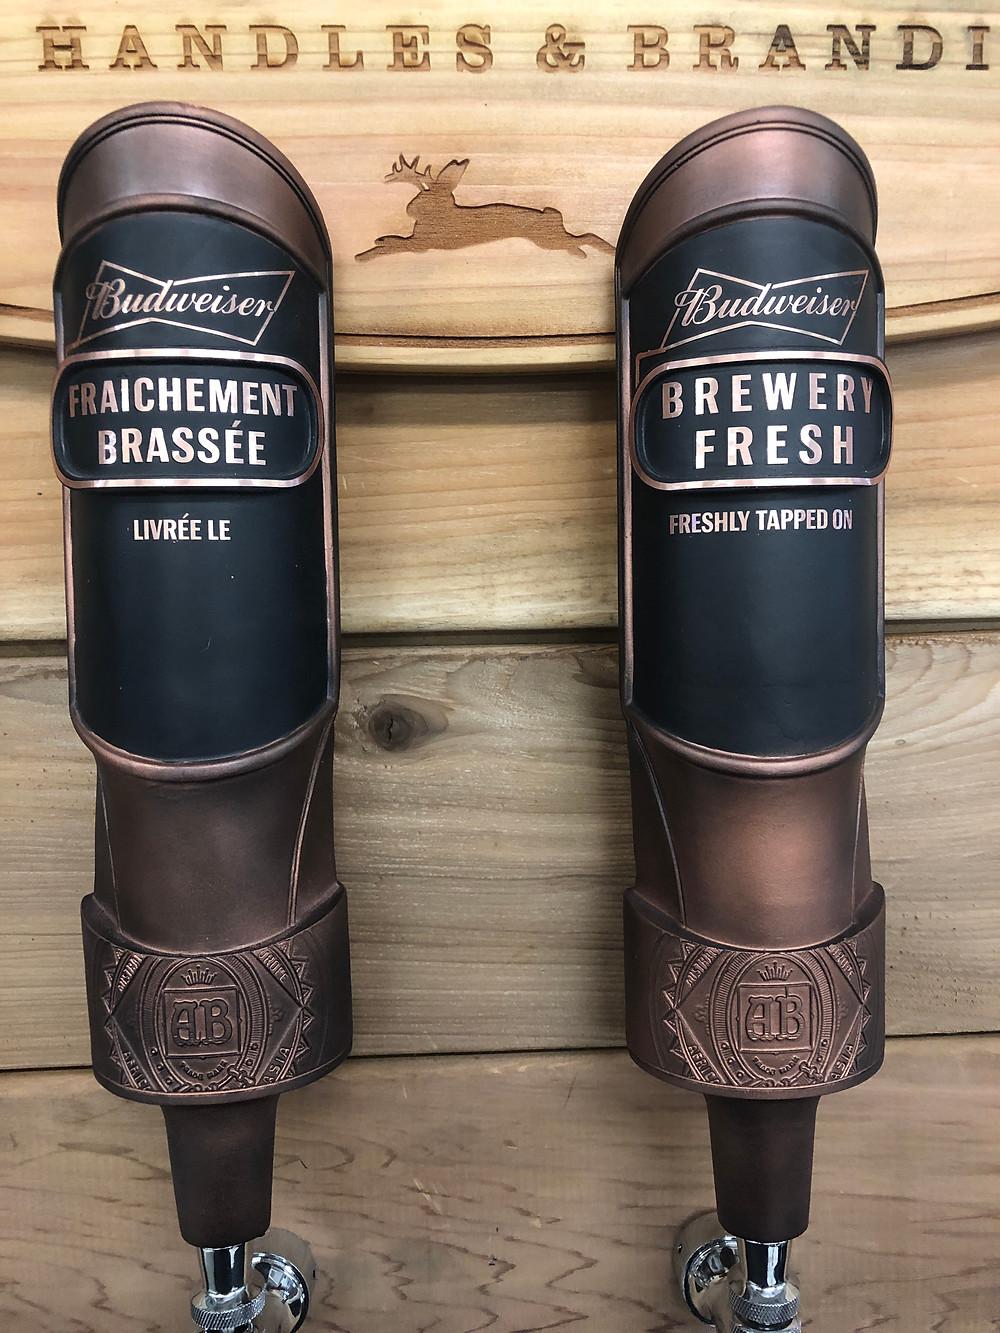 Budweiser brewery fresh tap handles